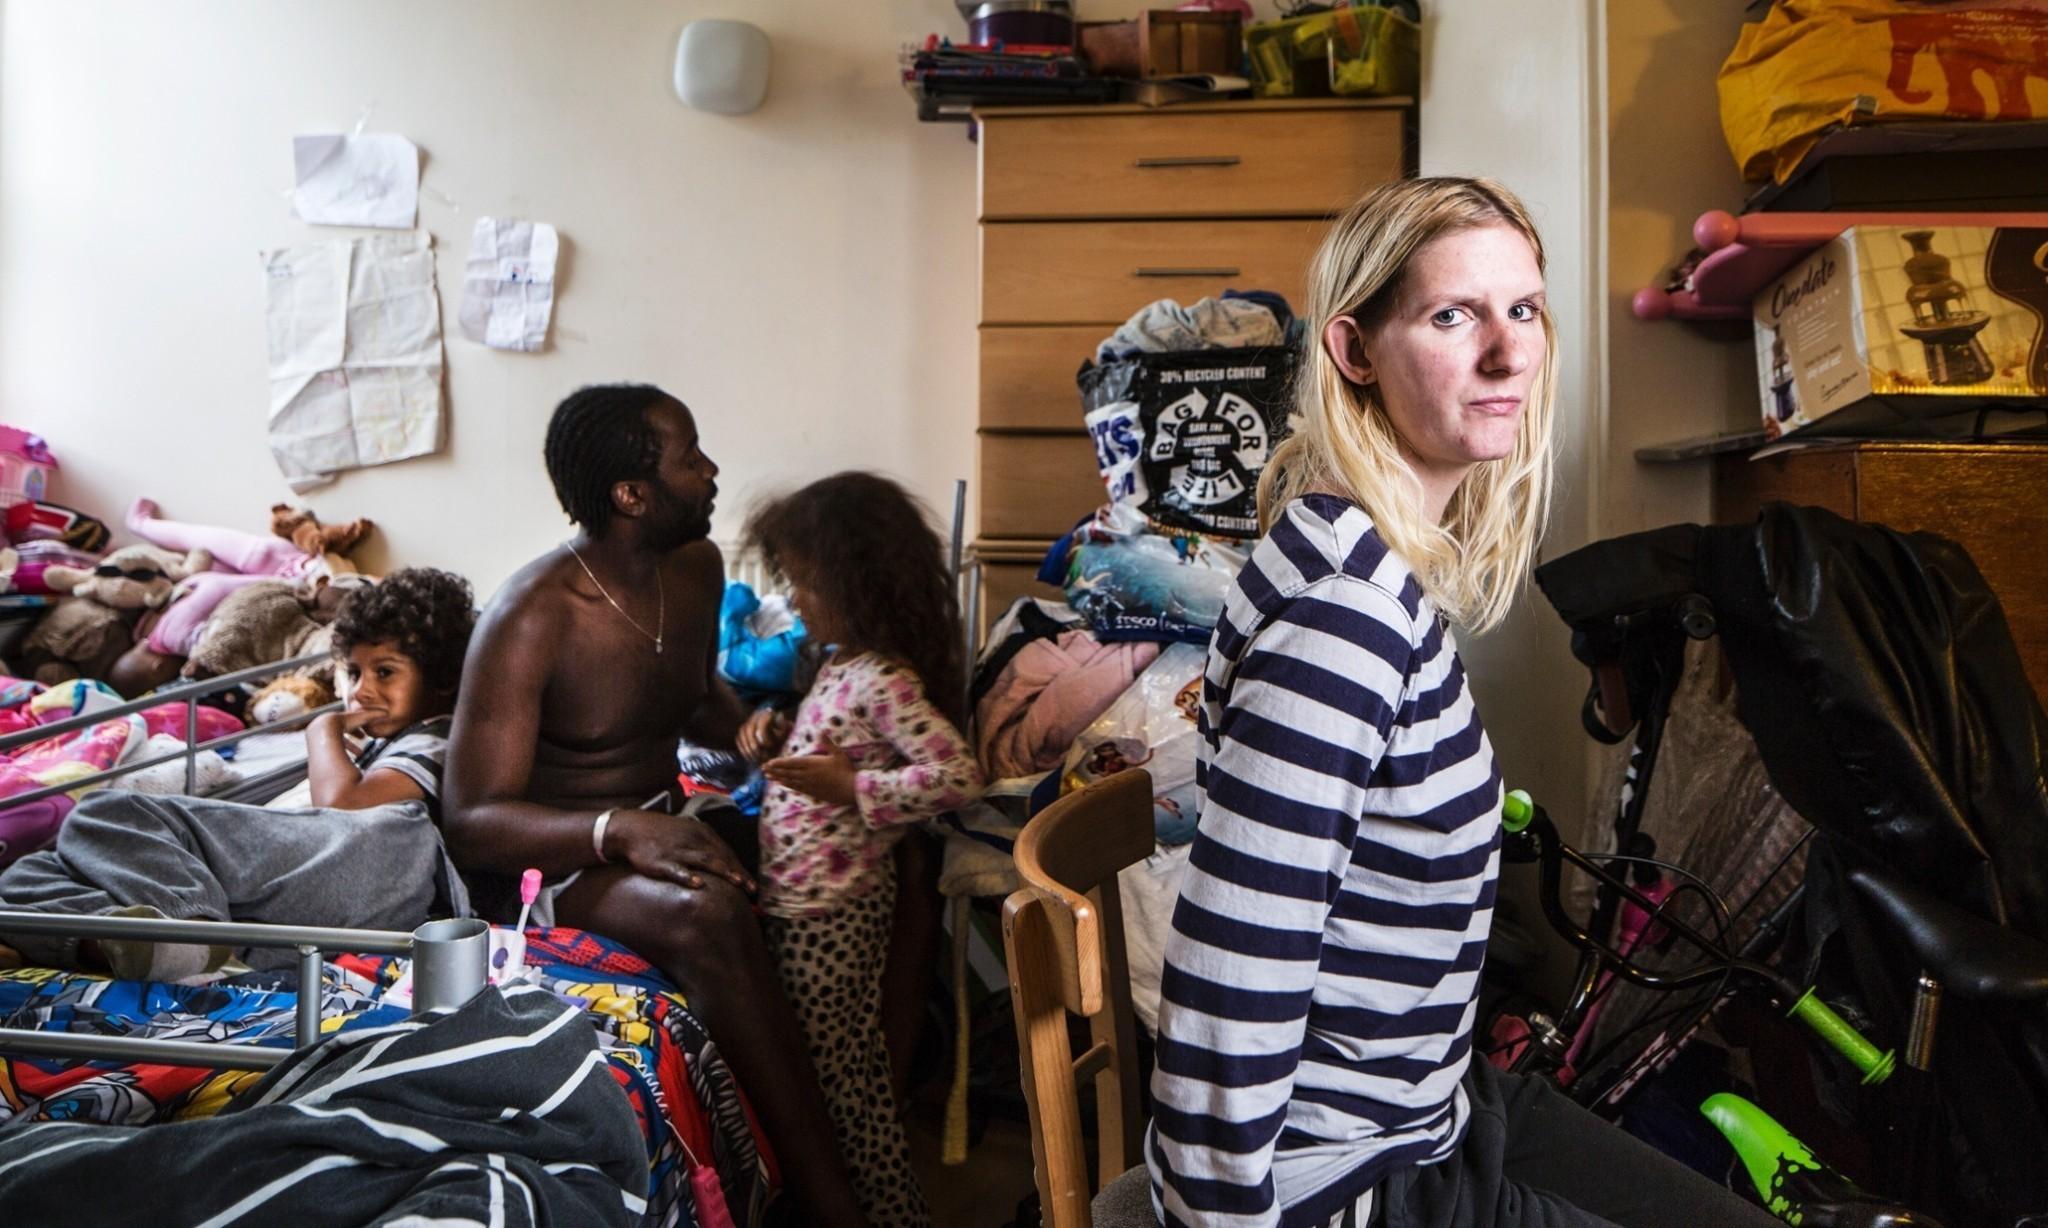 No exit: Britain's social housing trap